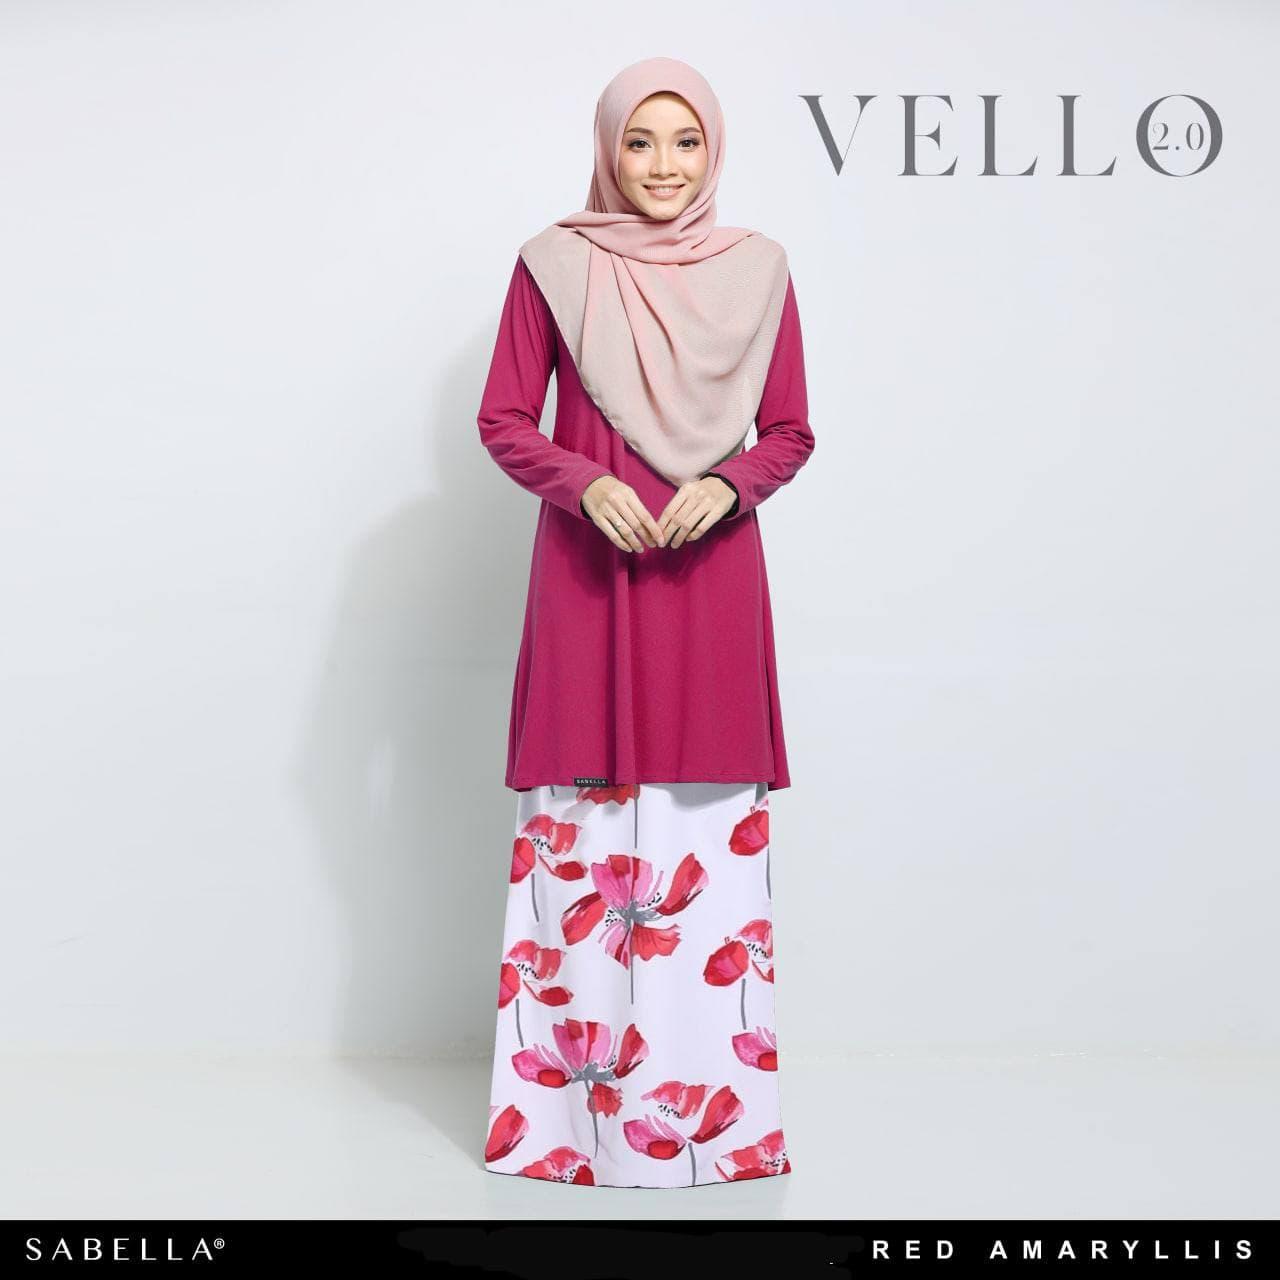 Vello 2.0 Red Amaryllis